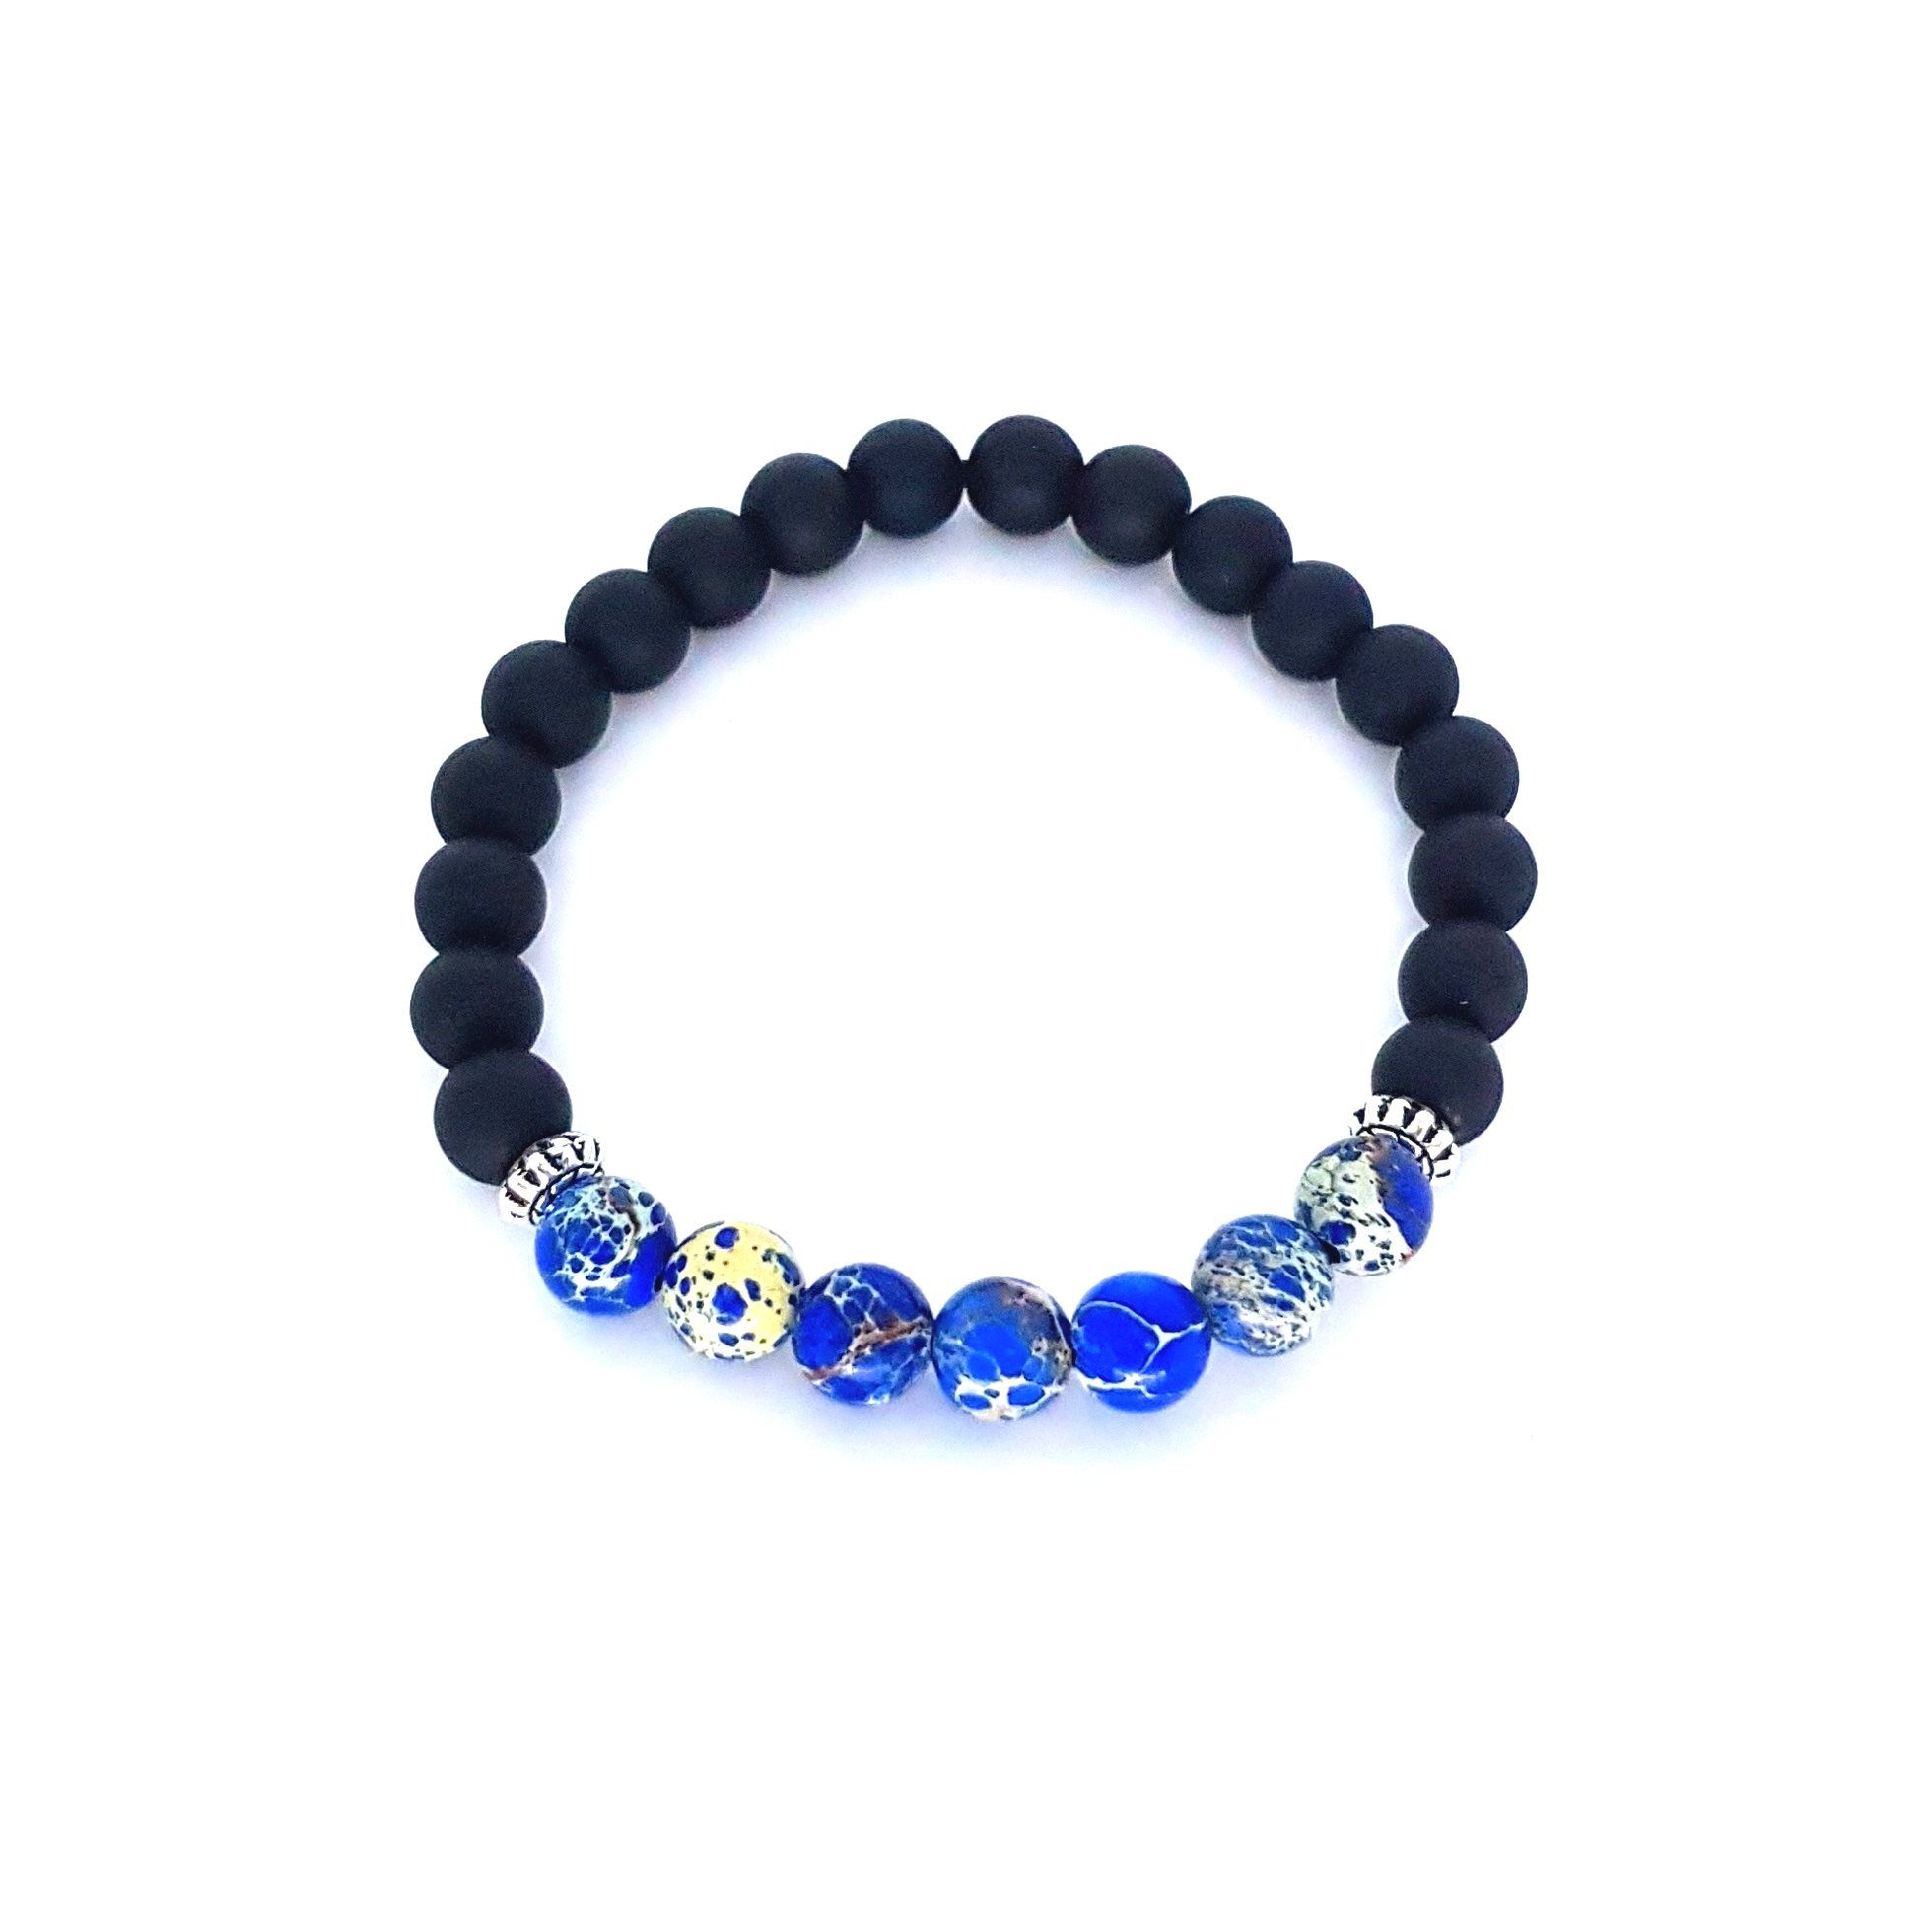 Pulseira de Pedra Fosca e Jasper Azul